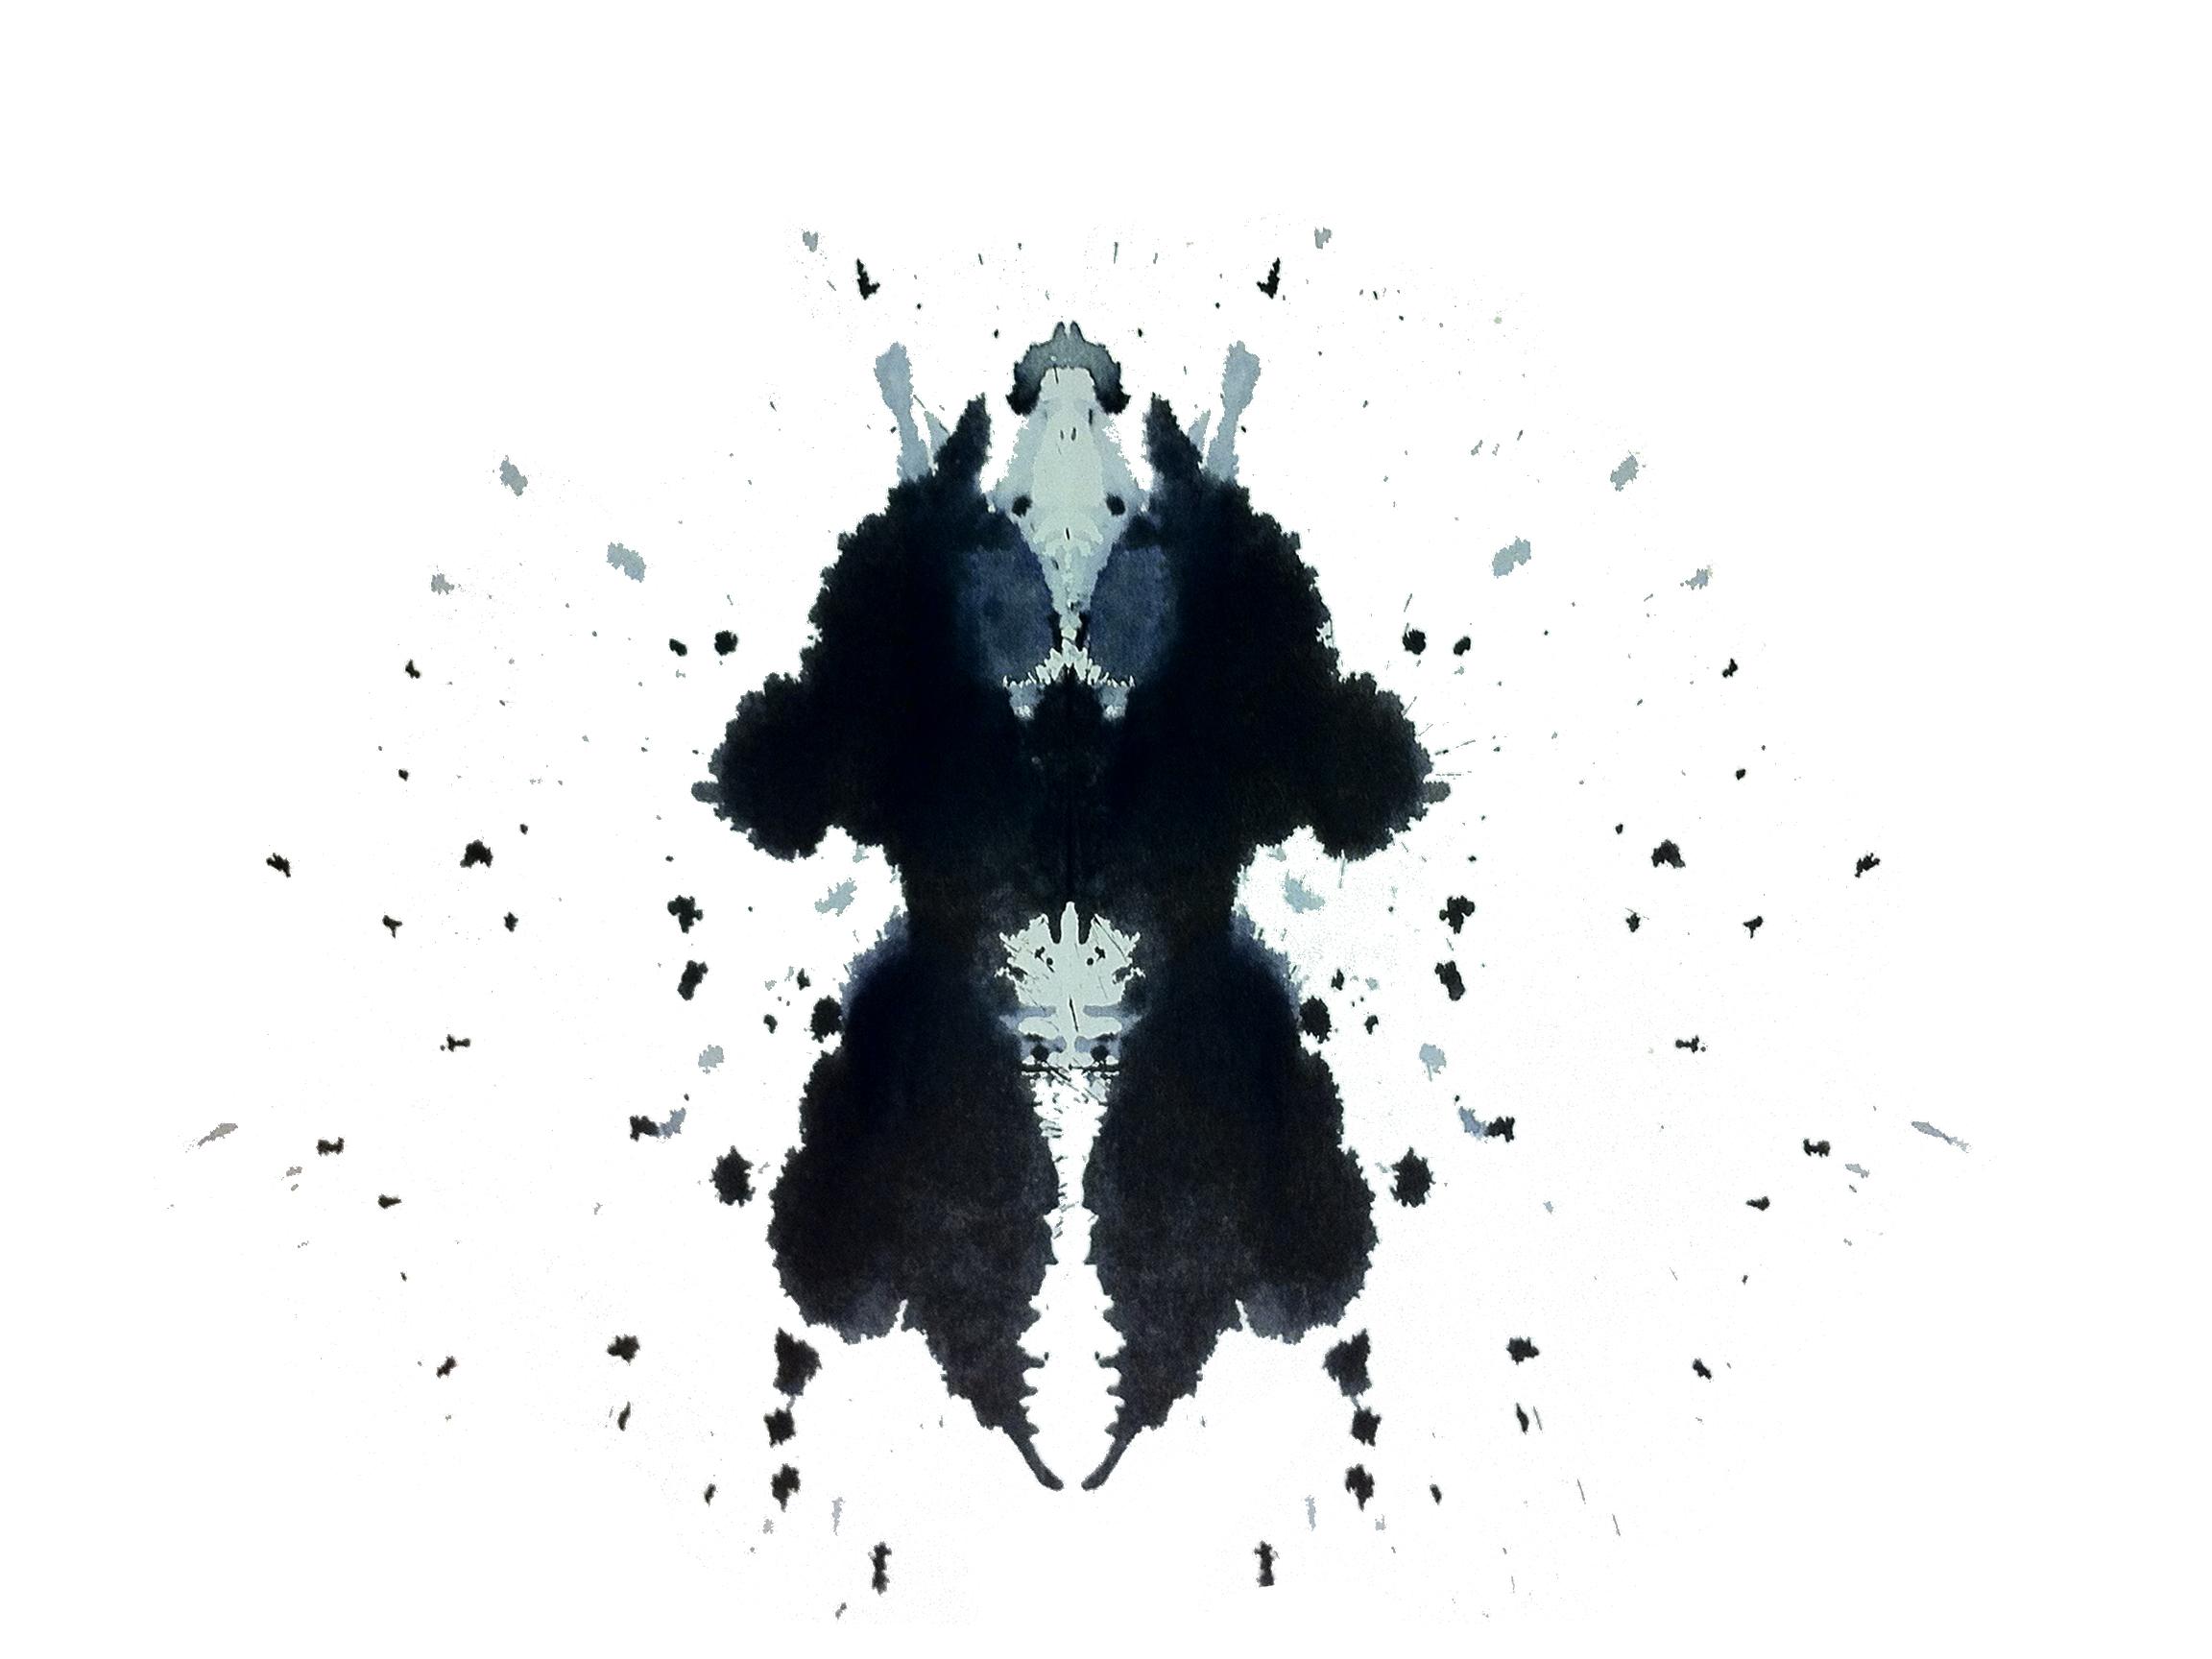 Rorschach Watchmen Wallpaper Hd Exilliteratur Part Five Rorschach Gif Prosthetic